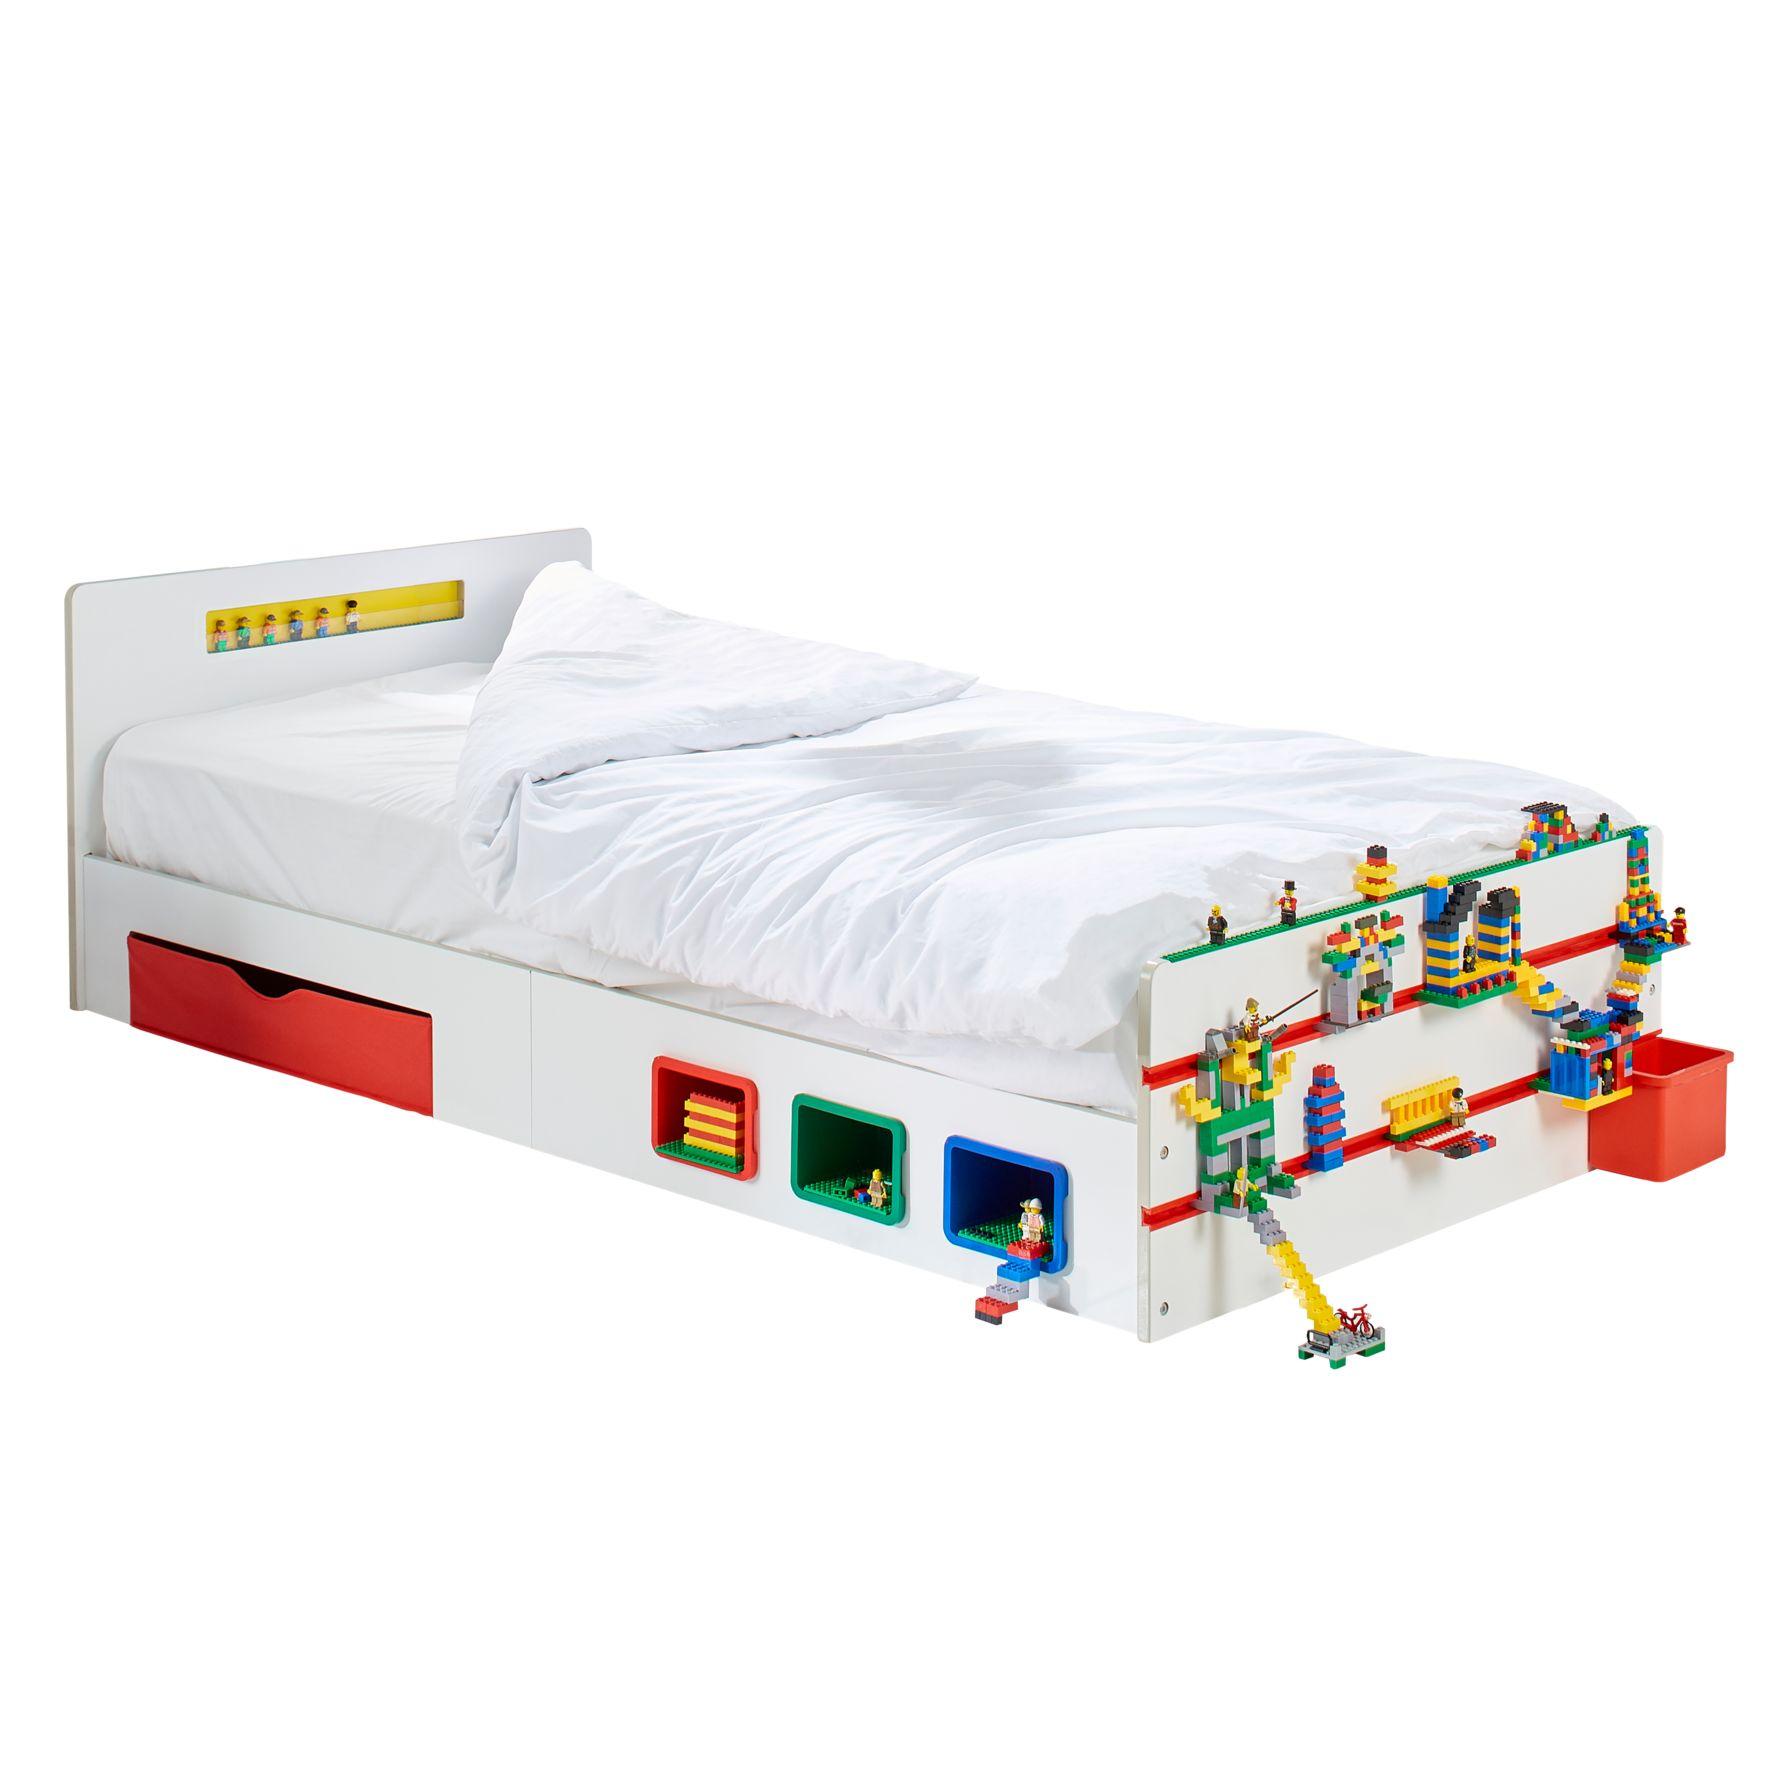 Room 2 Build - Kids 2m Single Bed with Storage (525RTB01EM)